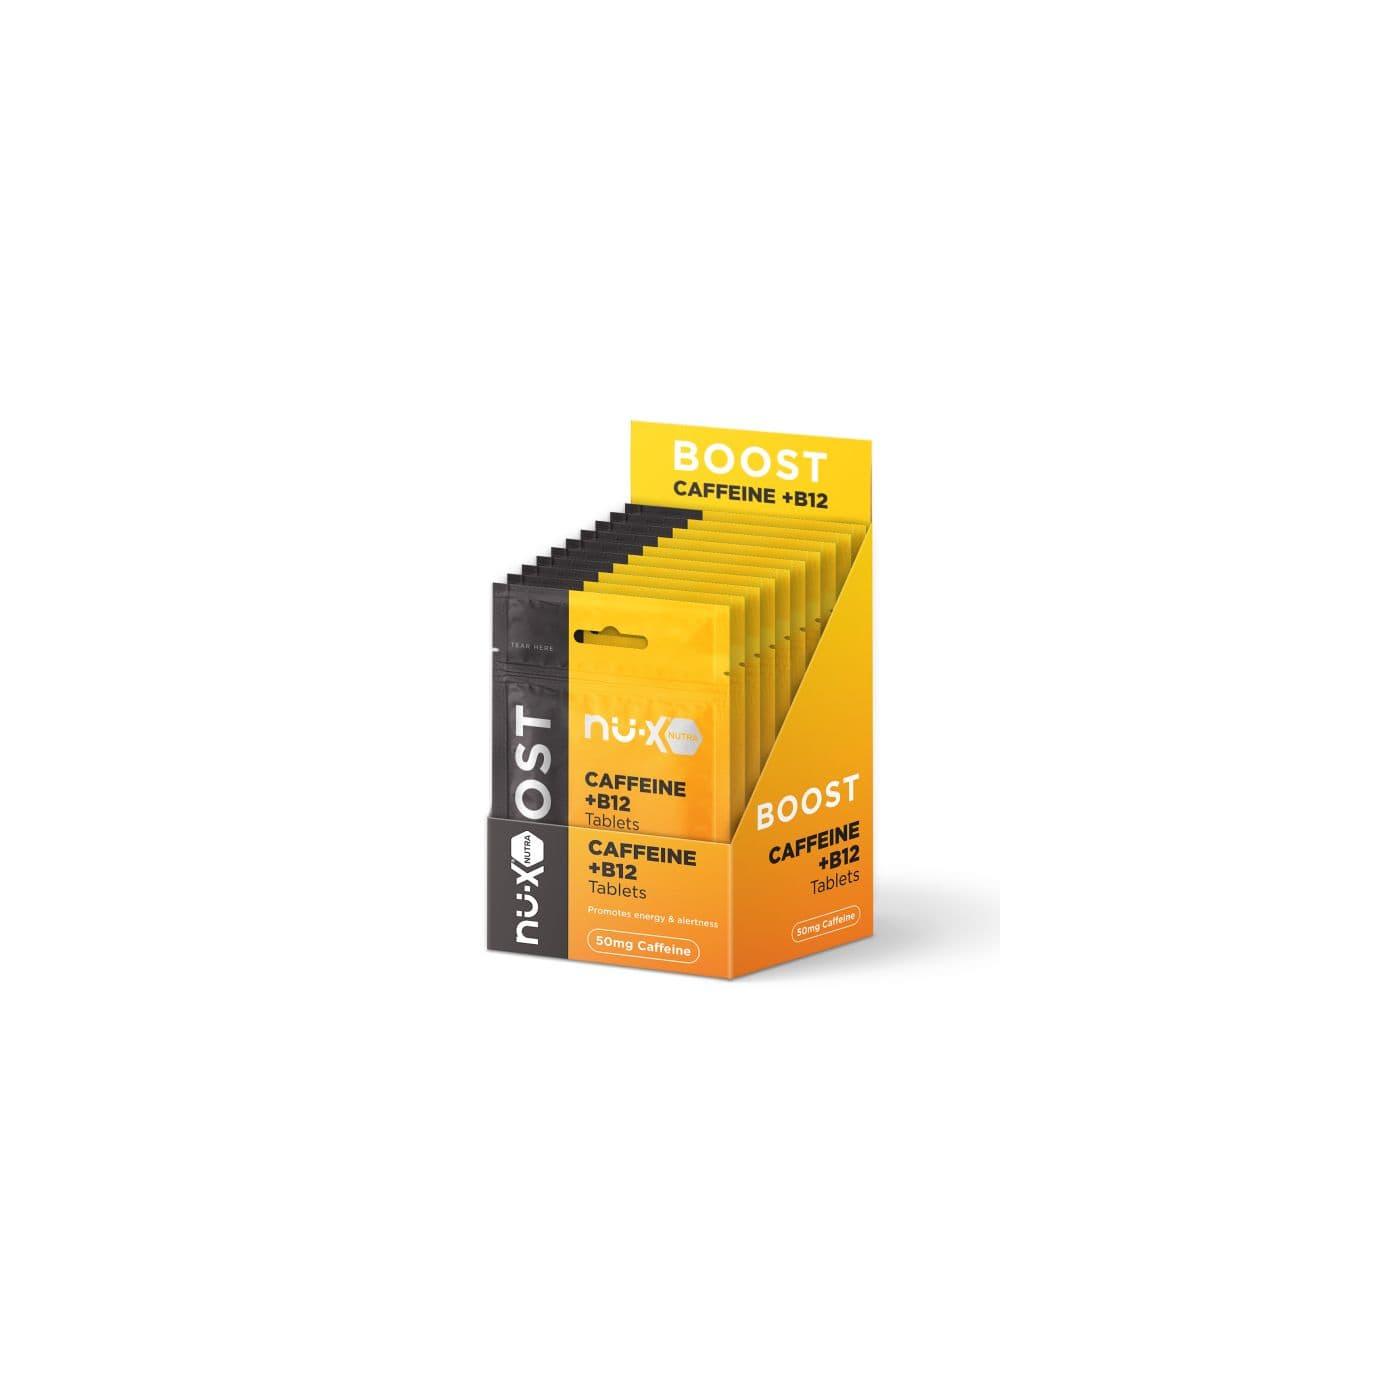 Nu-X Caffeine/B12 Chewable Tablets Boost - Carton